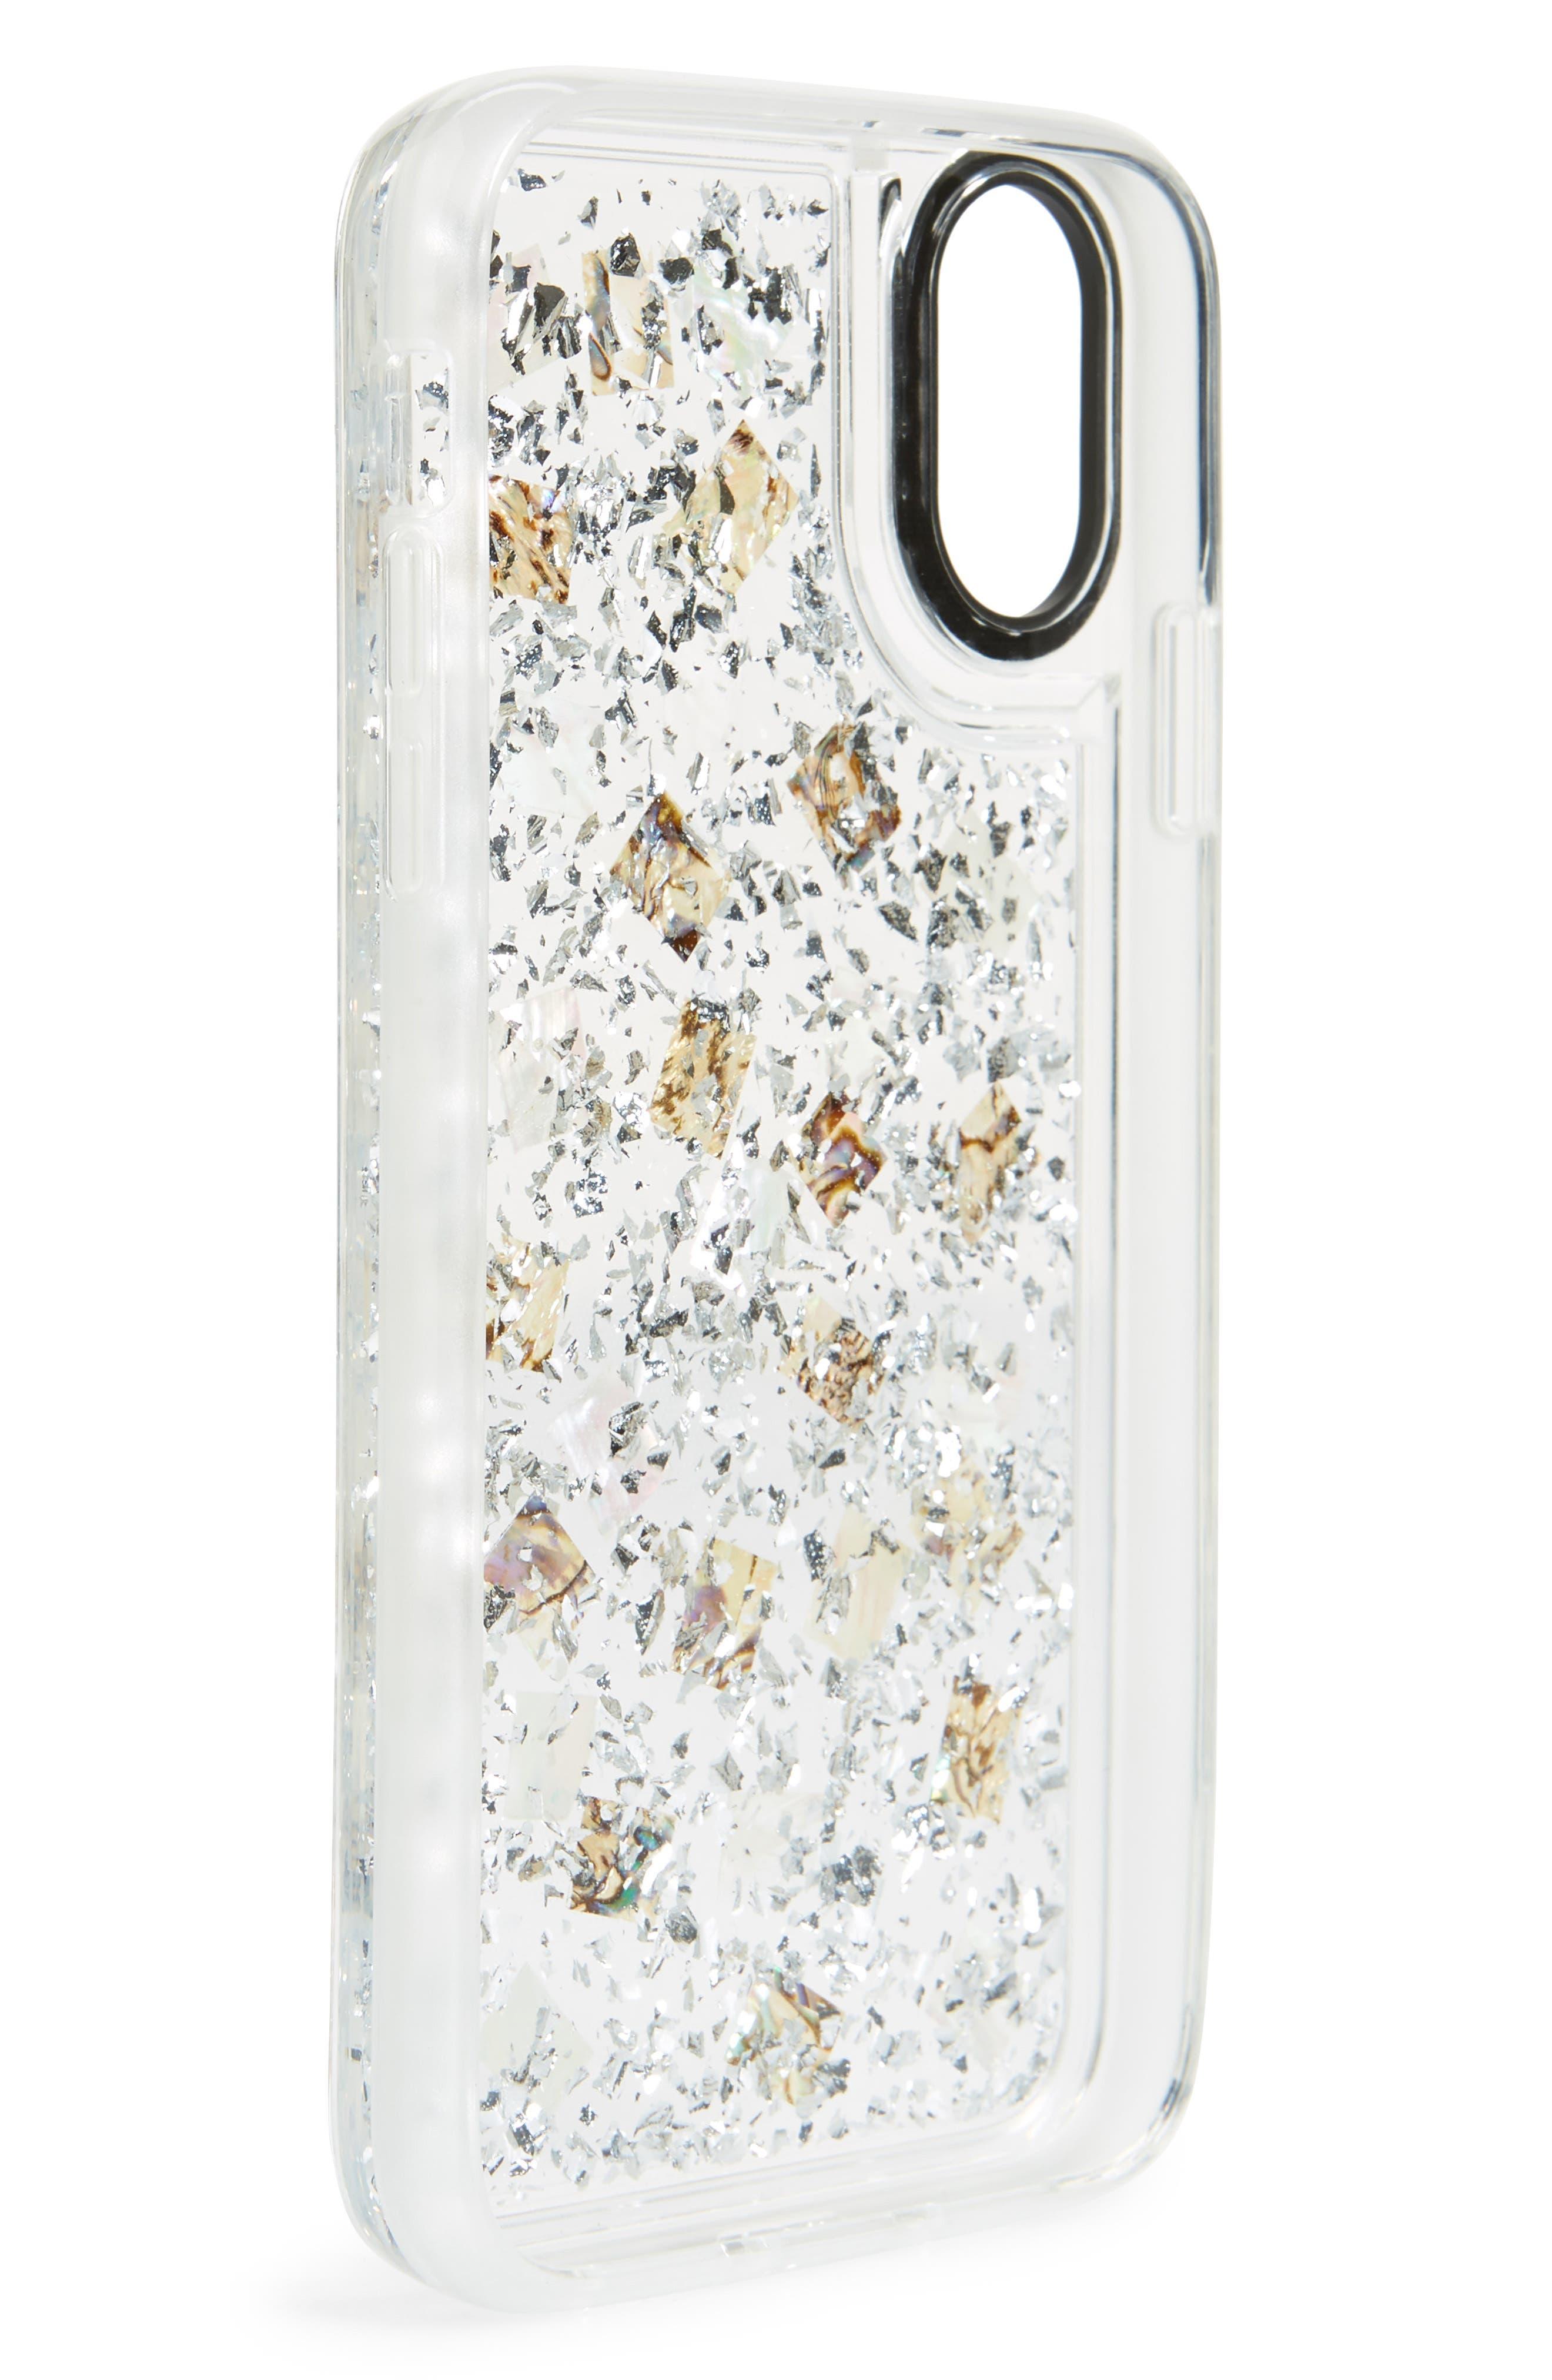 24 Karat Magic iPhone X/Xs, XR & X Max Case,                             Alternate thumbnail 2, color,                             SILVER/ CLEAR